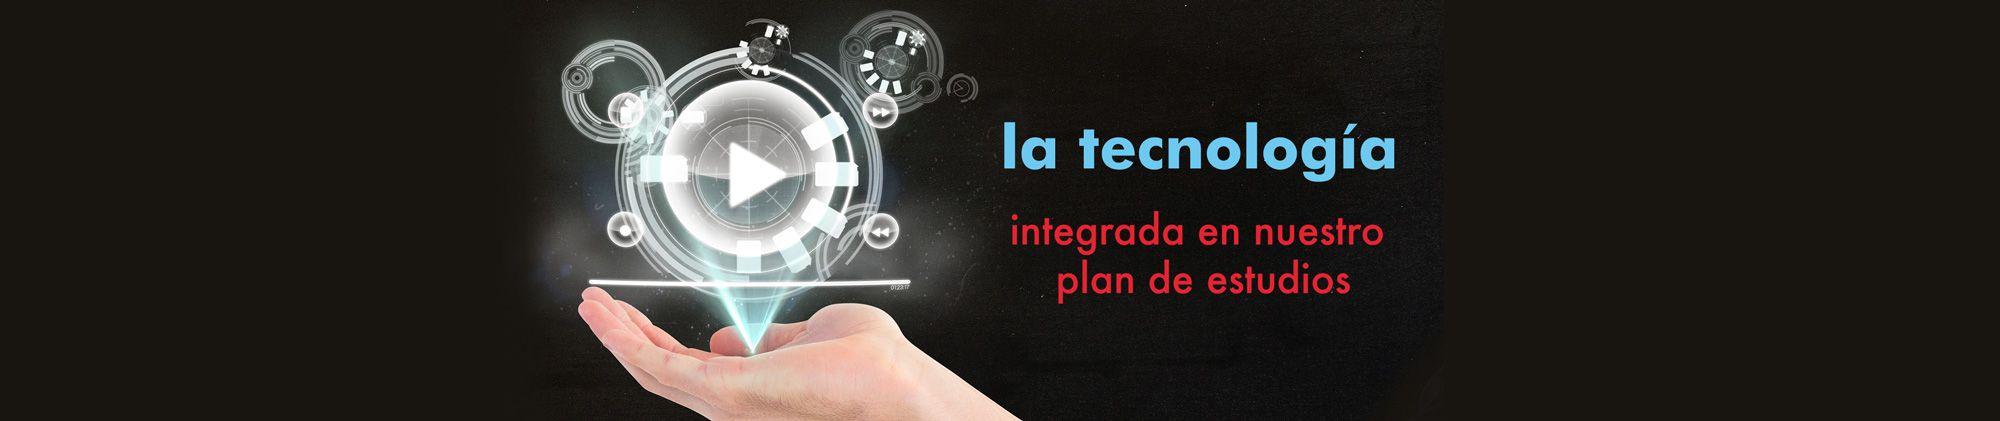 Tecnologia IES Las Rozas 1